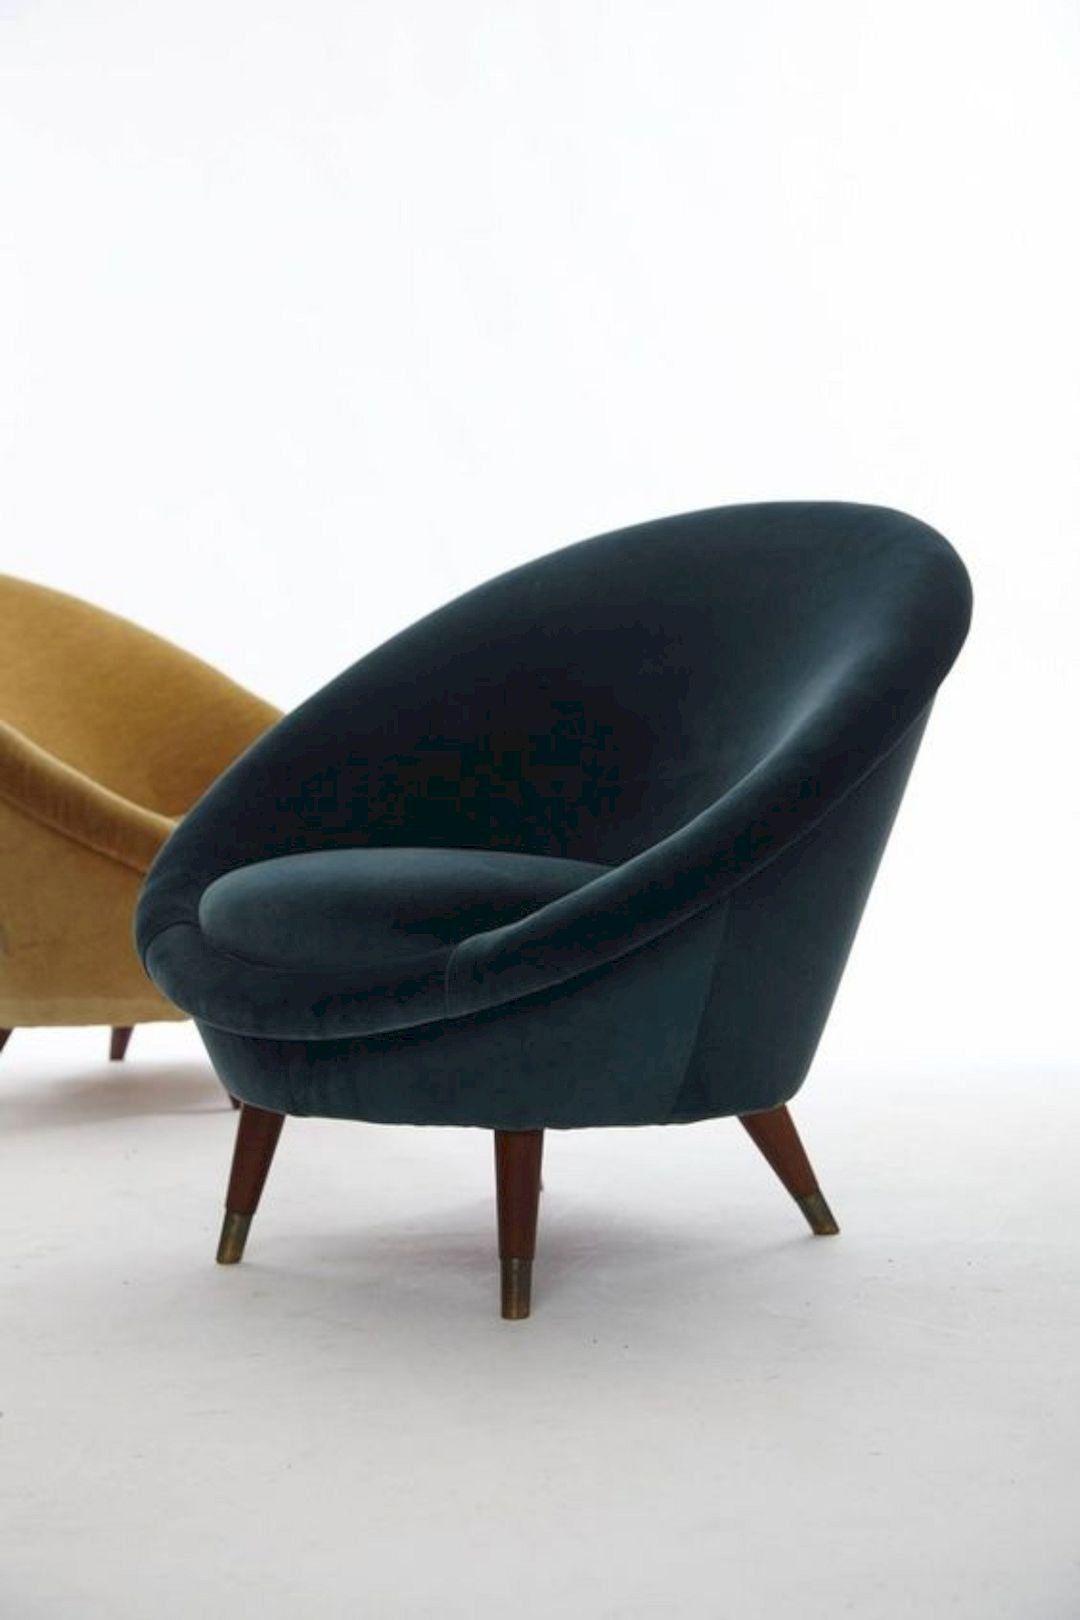 16 Amazing Egg Chair Designs Https Www Designlisticle Com Egg